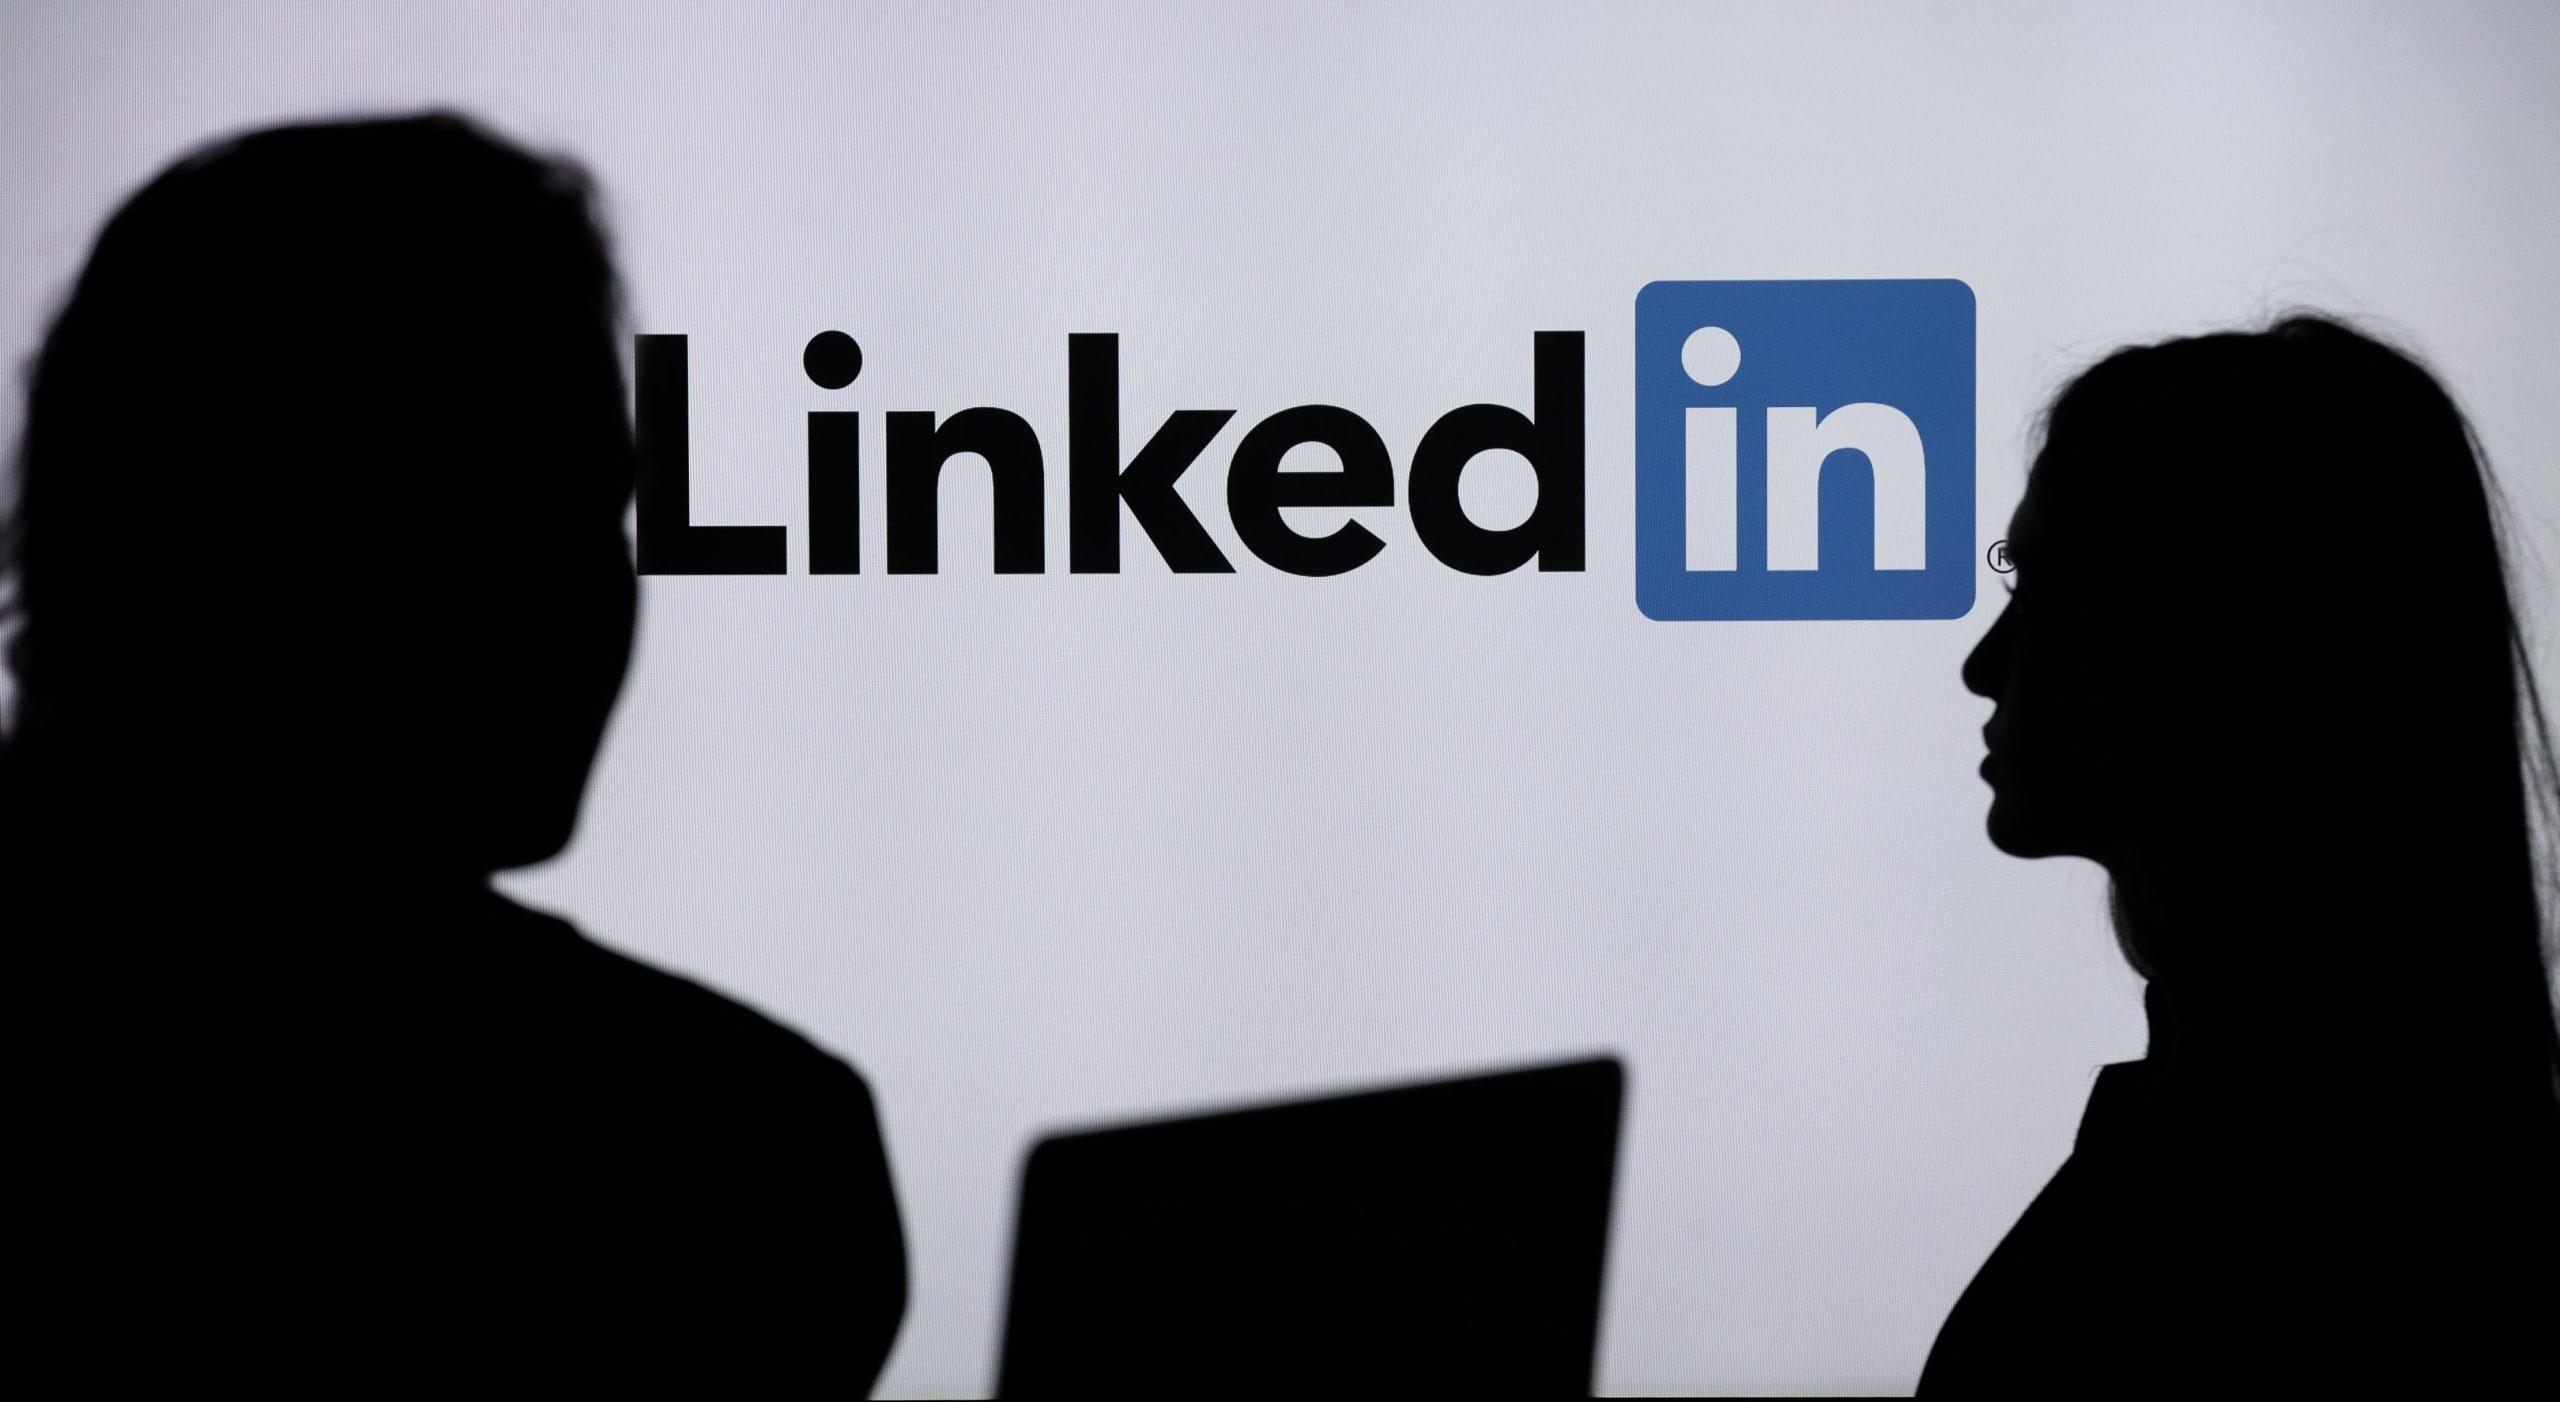 U.S. Supreme Court revives LinkedIn bid to shield personal data